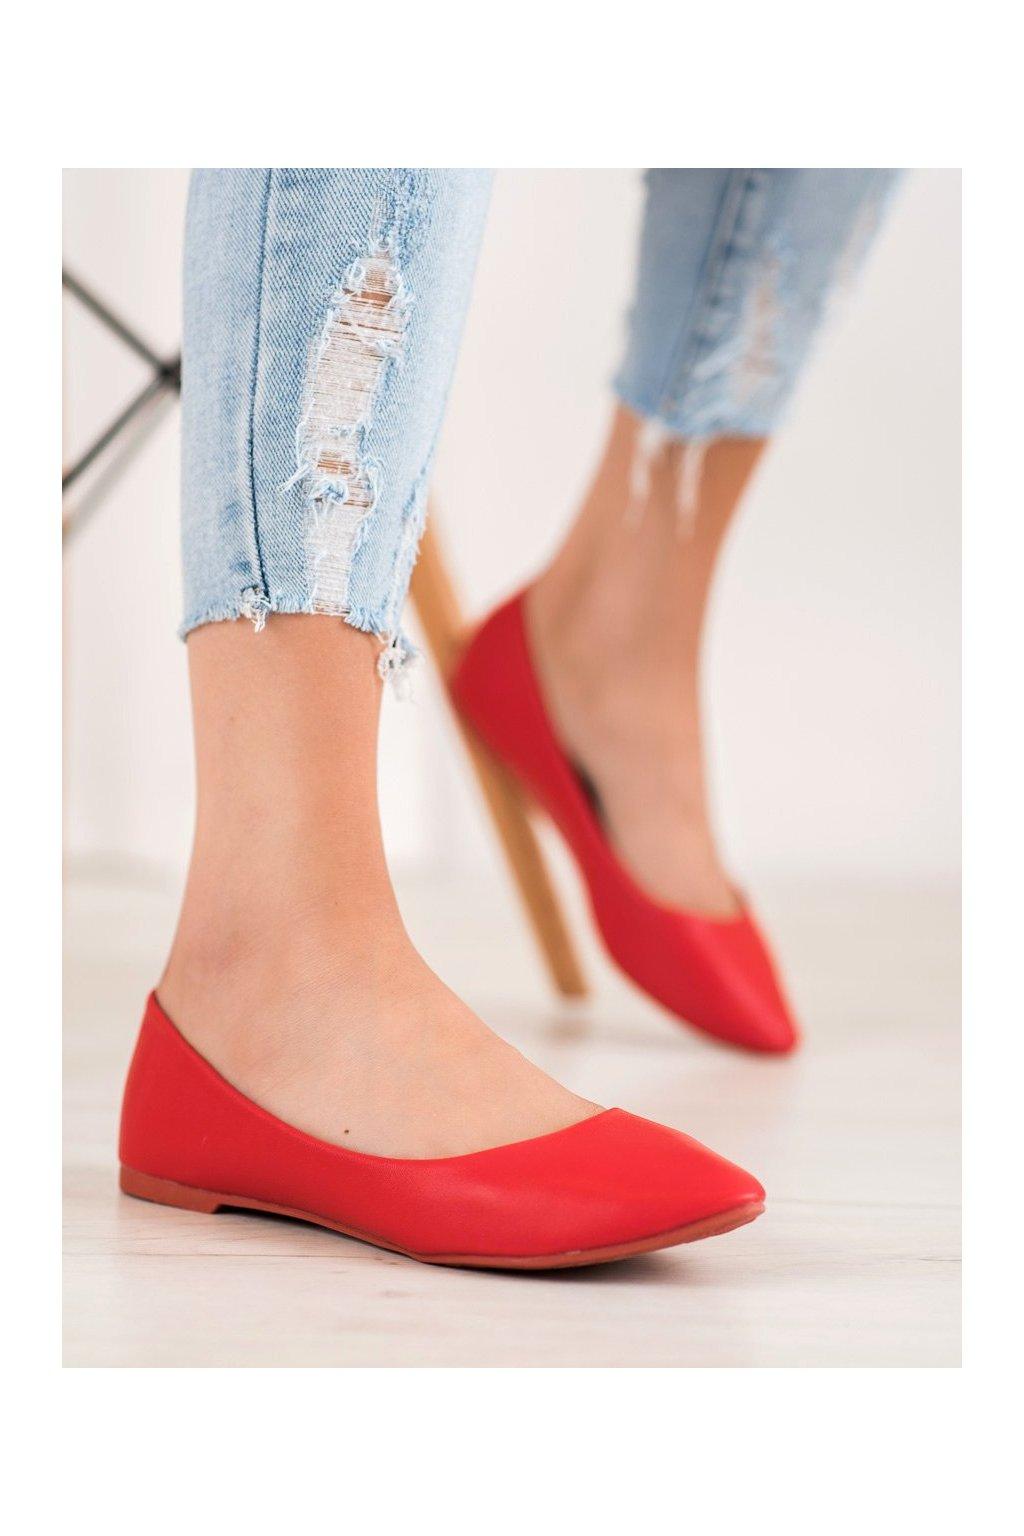 Červené dámske balerínky Seastar NJSK CC108R